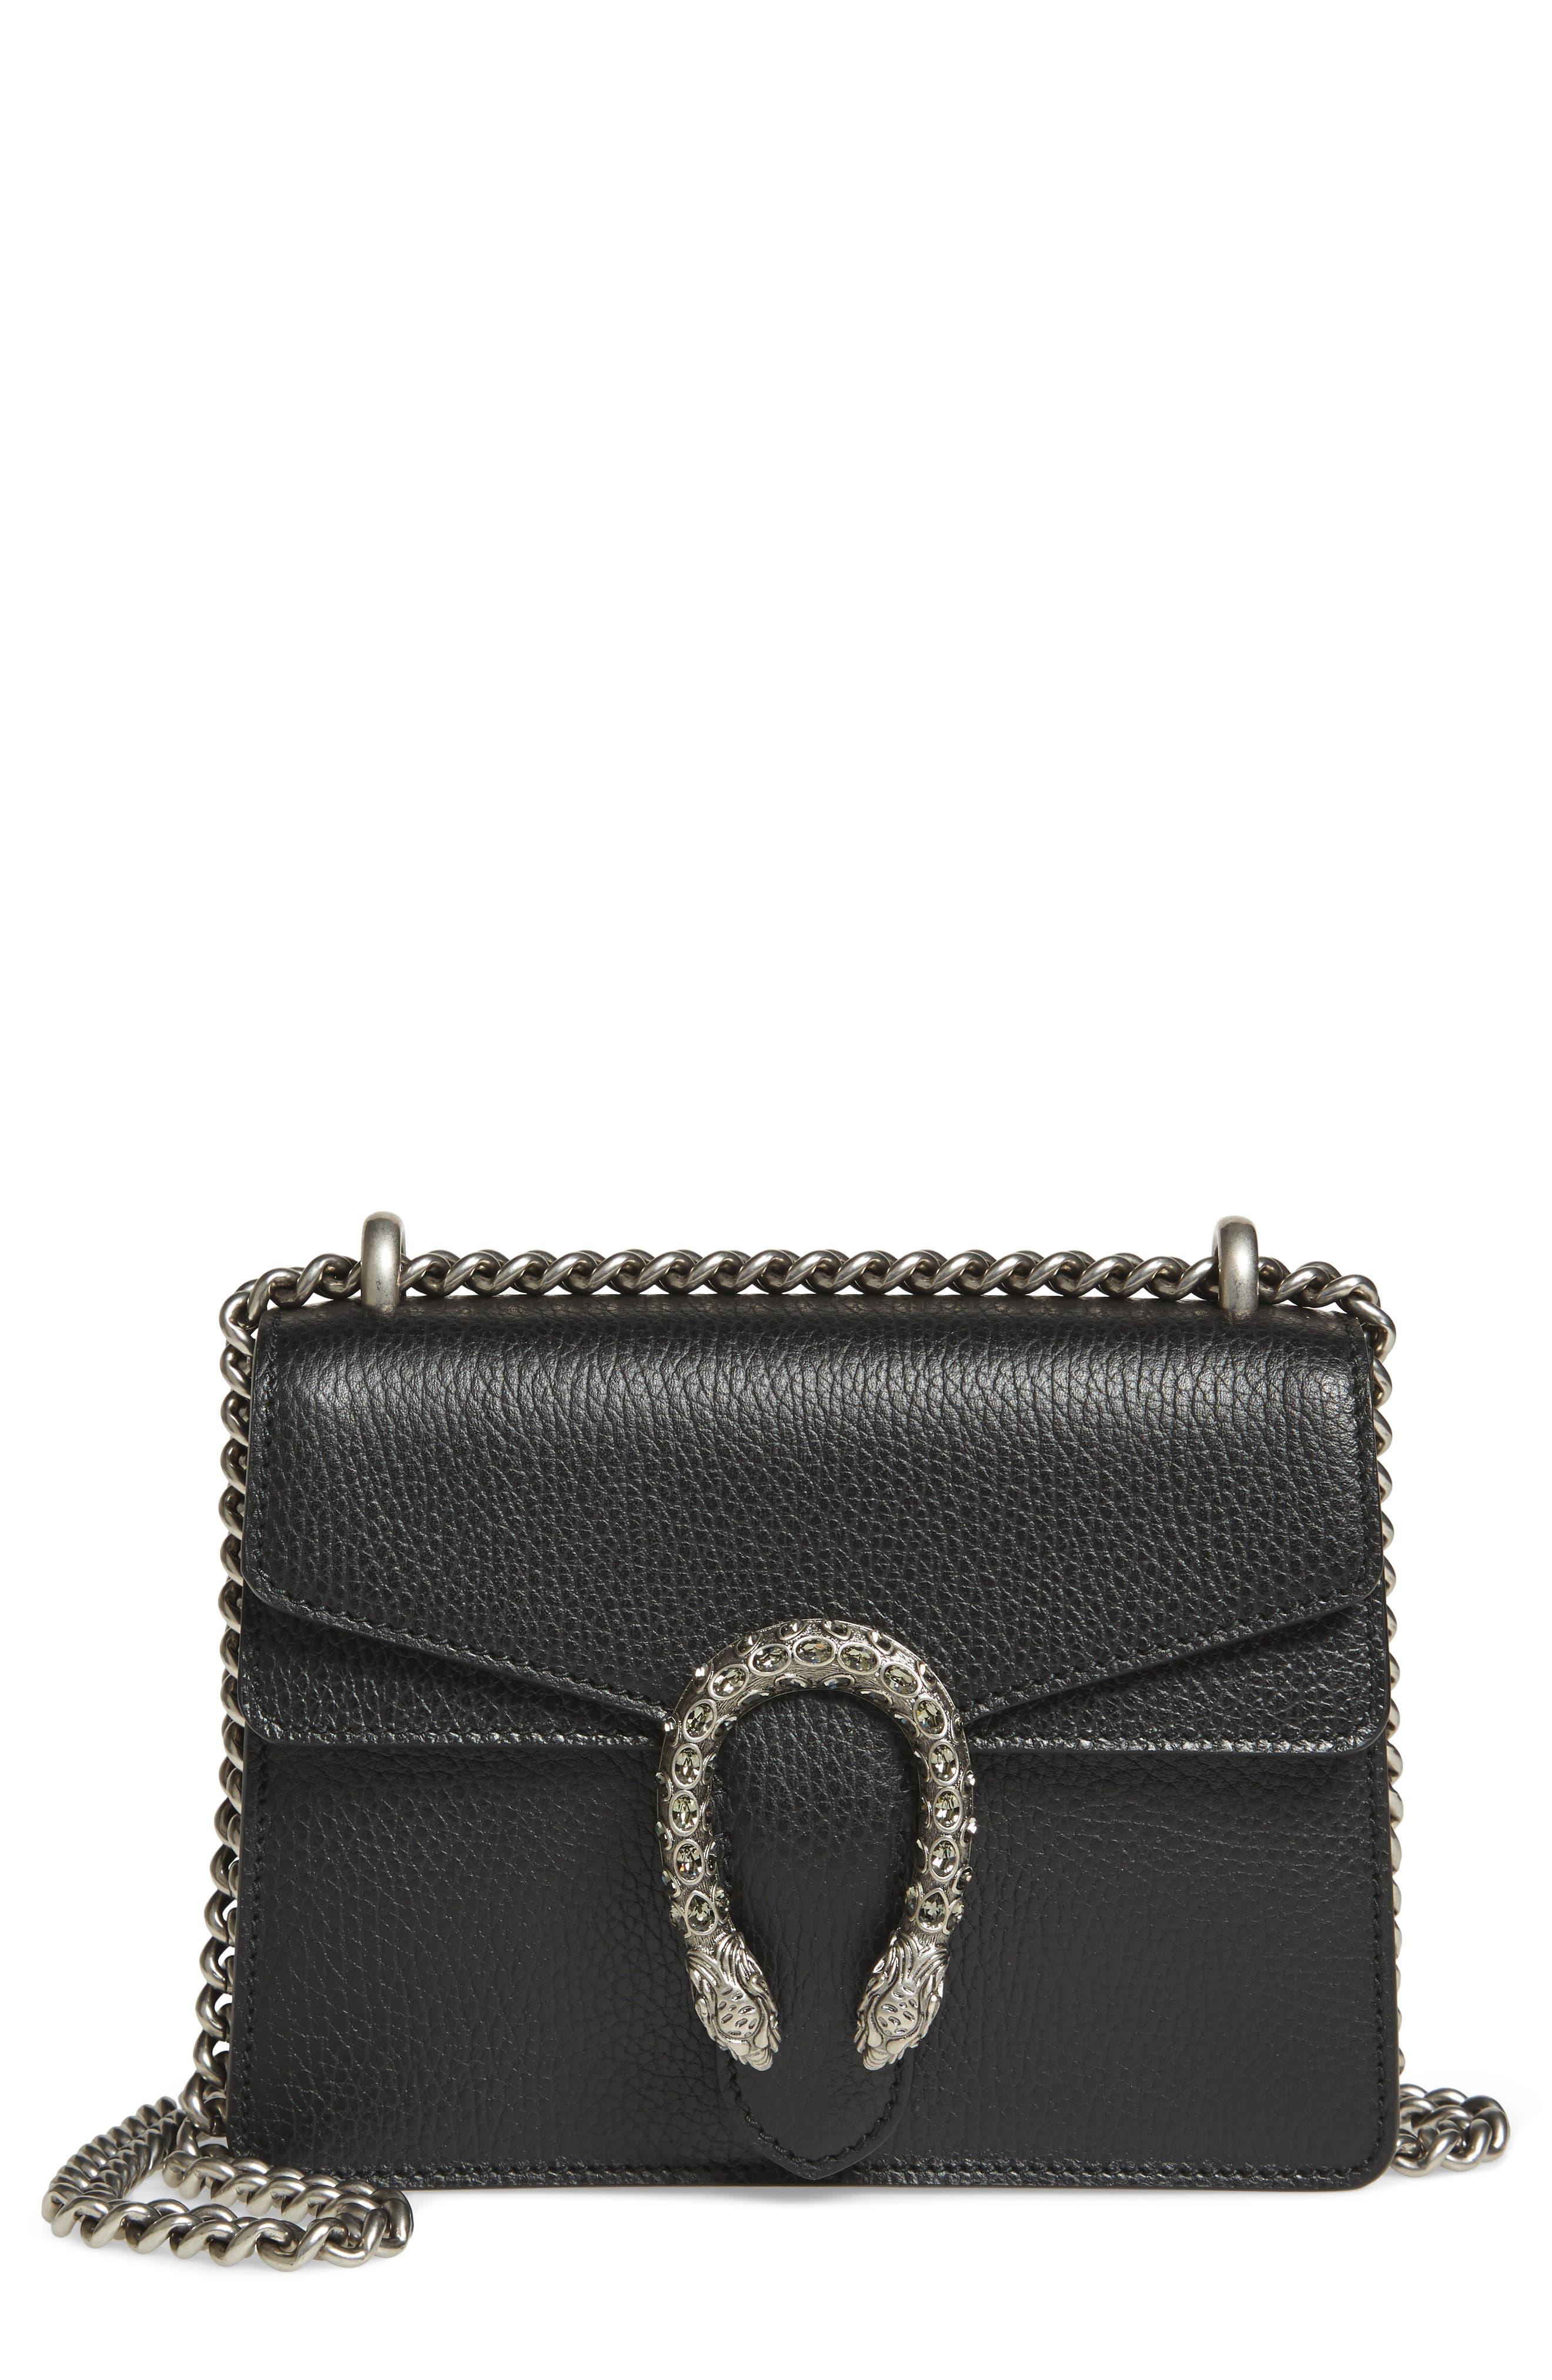 Alternate Image 1 Selected - Gucci Mini Dionysus Leather Shoulder Bag